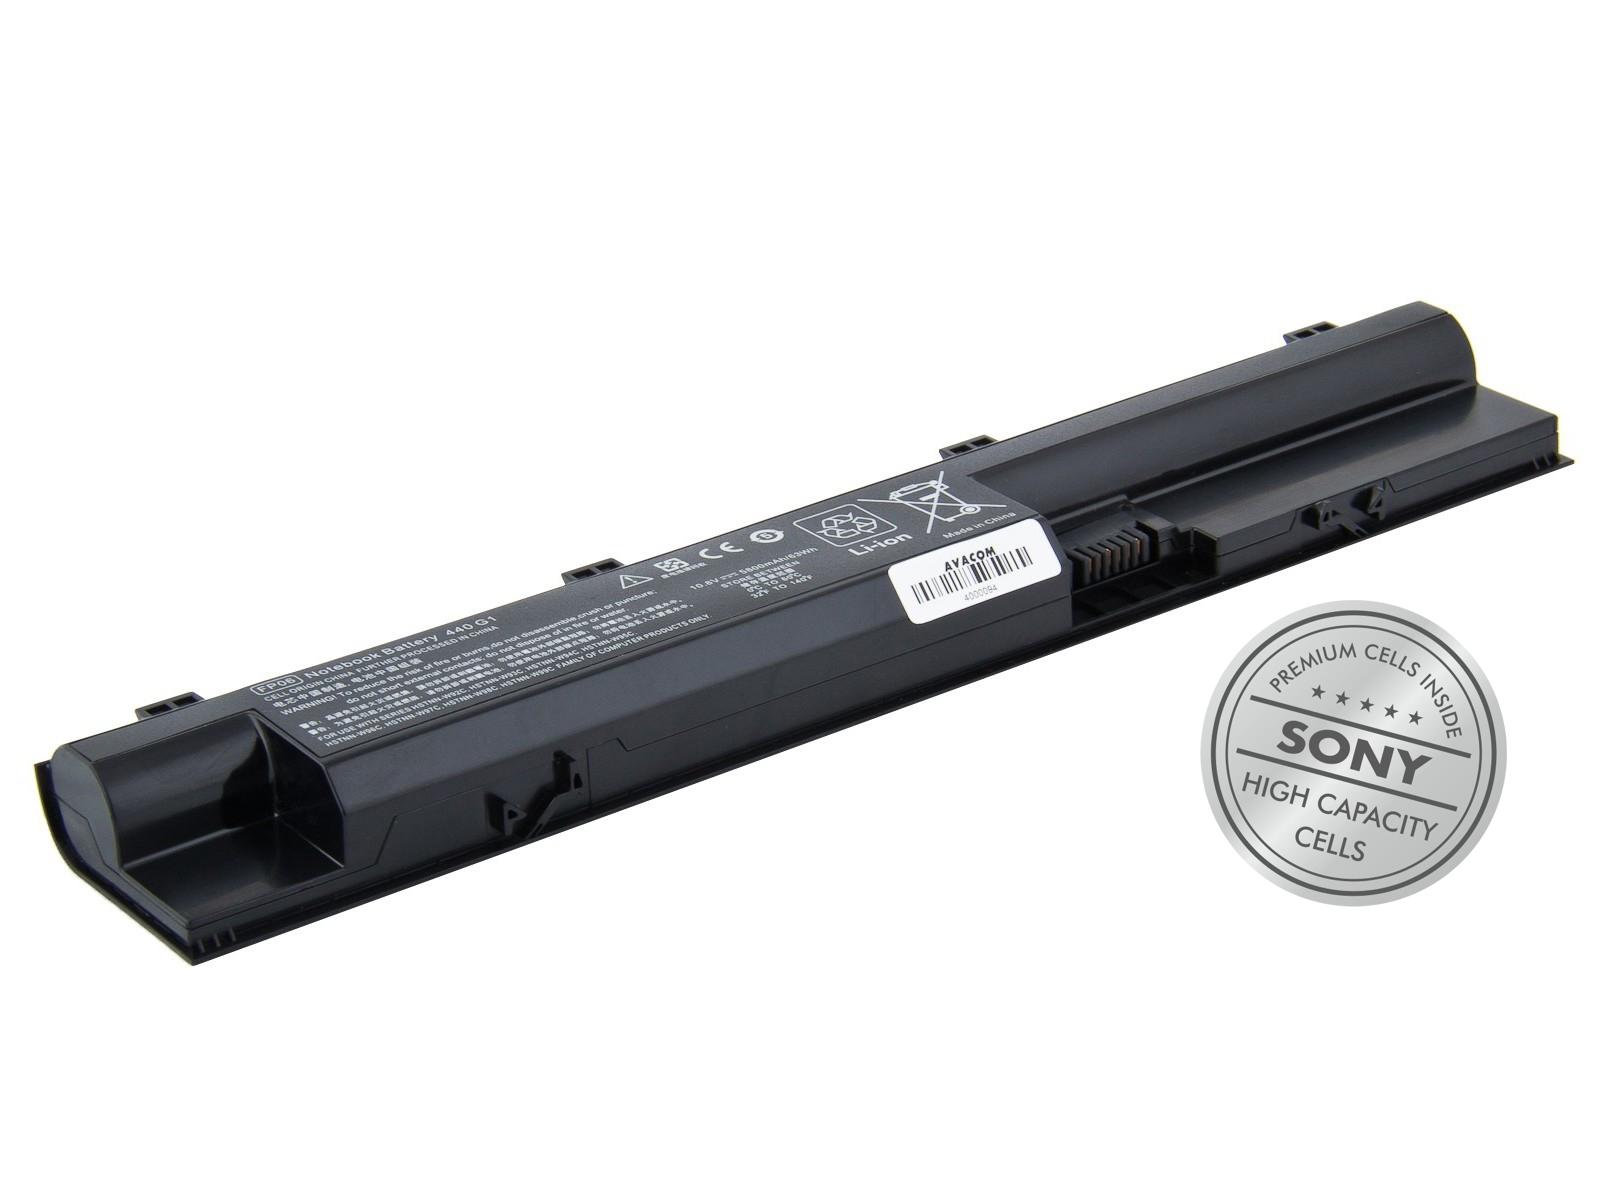 Náhradní baterie AVACOM HP 440 G0/G1, 450 G0/G1, 470 G0/G1 Li-Ion 10,8V 5800mAh/ 63Wh